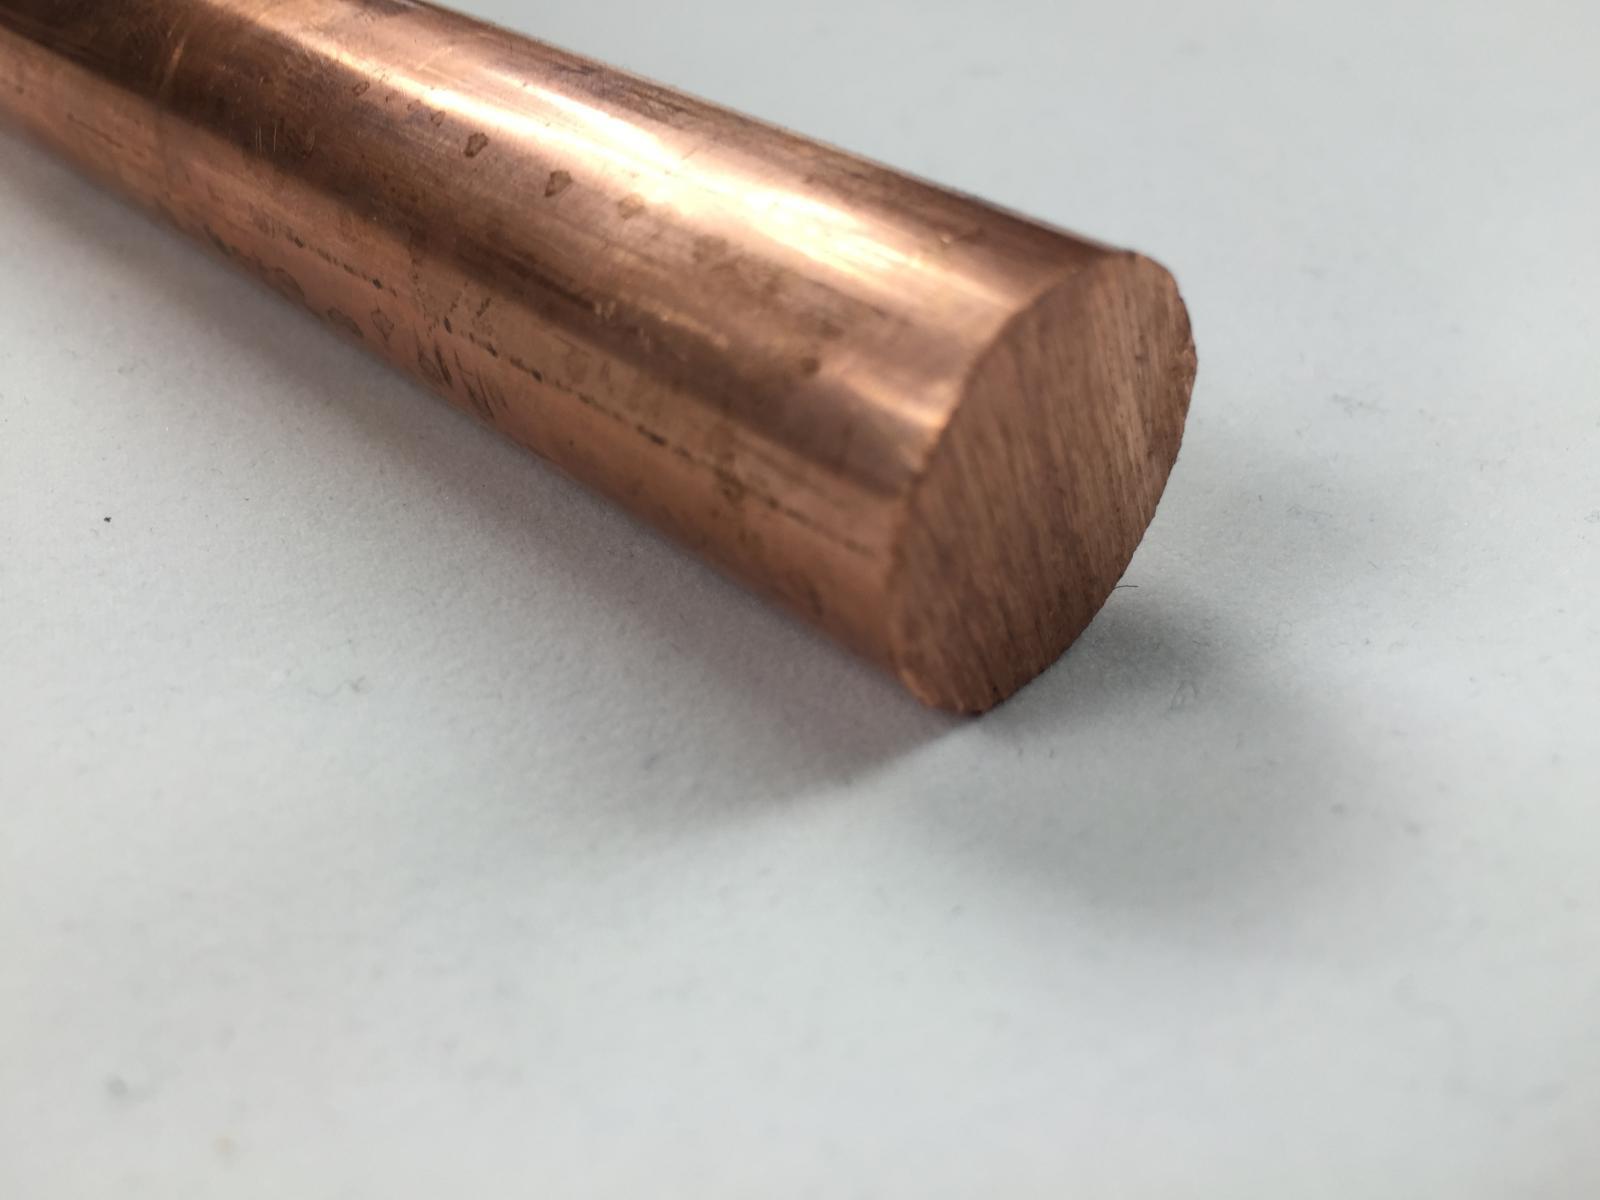 Copper round bar rod spot welding various sizes ebay